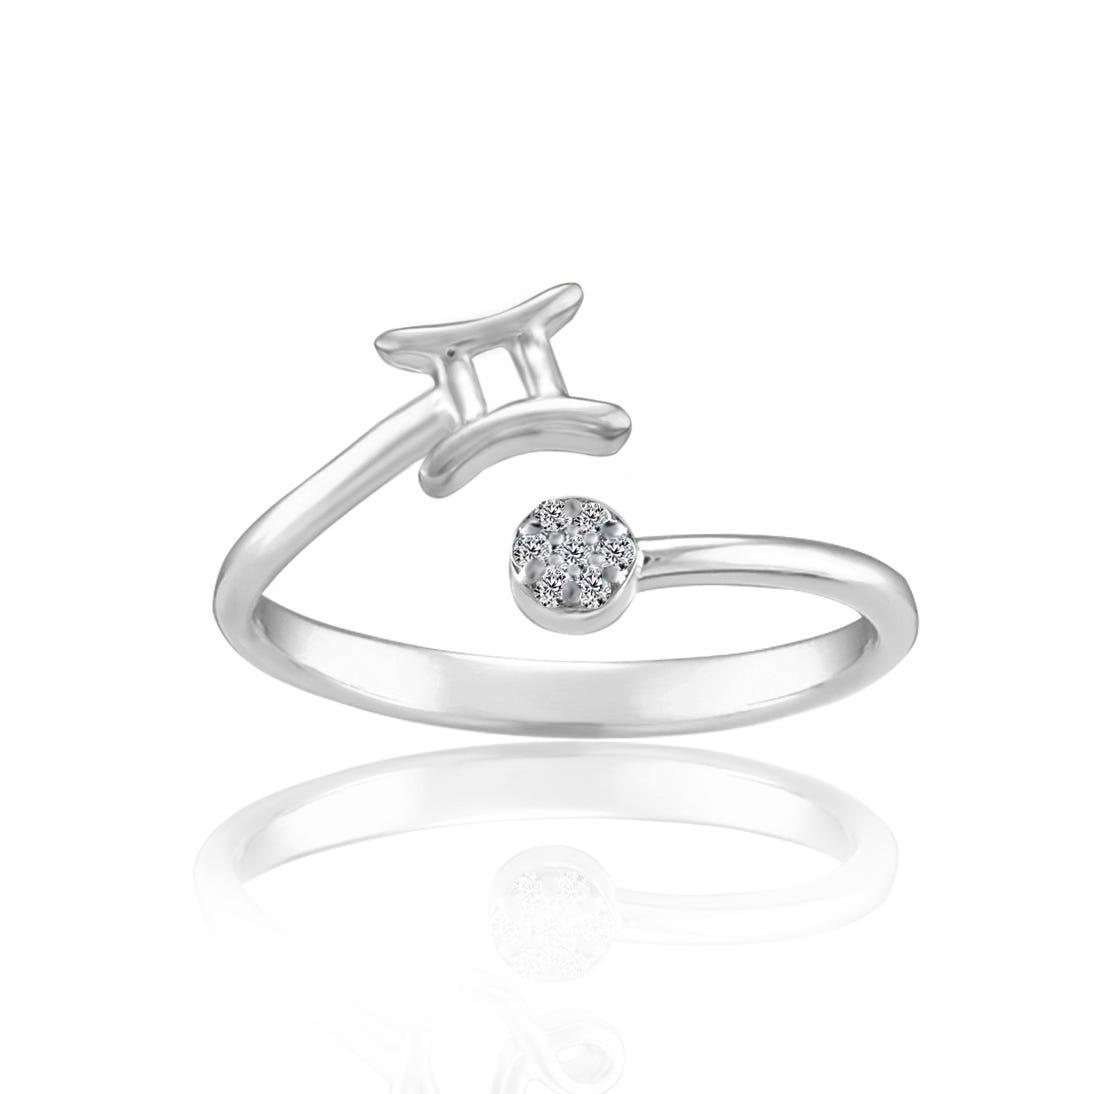 Zodiac Gemini Fashion Ring in Sterling Silver